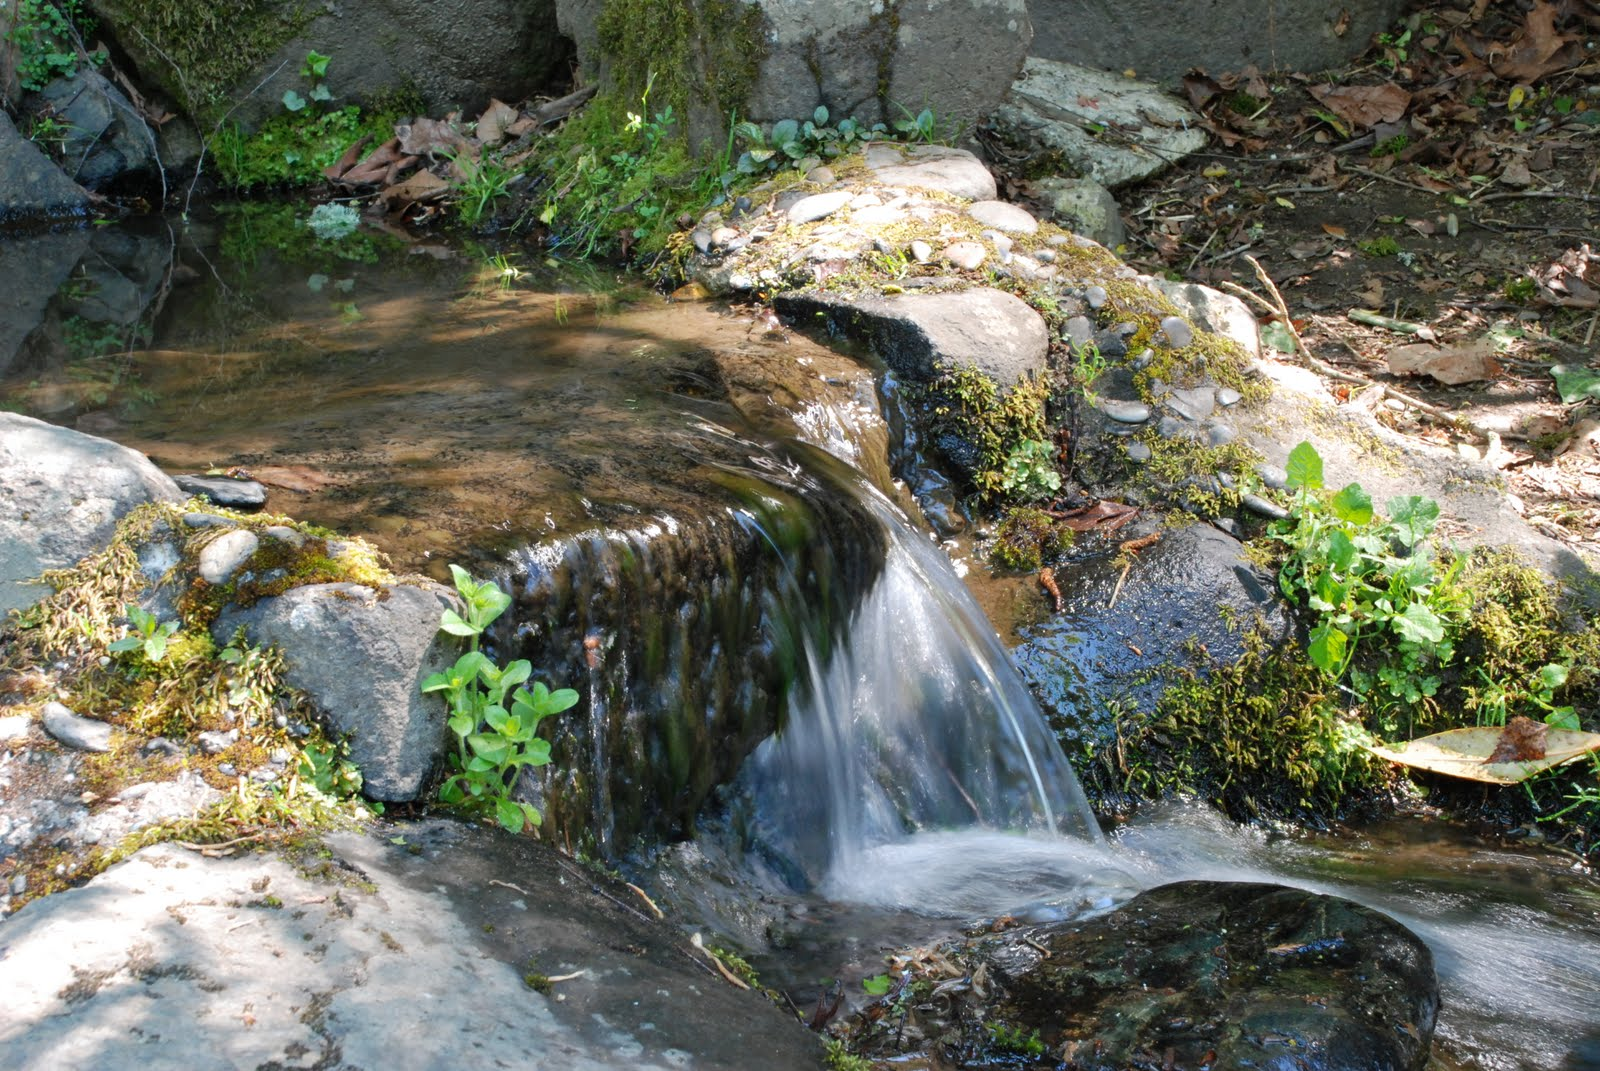 (http://4.bp.blogspot.com/_CRE_AWBPa2U/S-iHKcNs4II/AAAAAAAAABU/YqJ9PYn9BZ8/s1600/Photo+Class+Falls+Tumwater+5-2010+030.JPG)